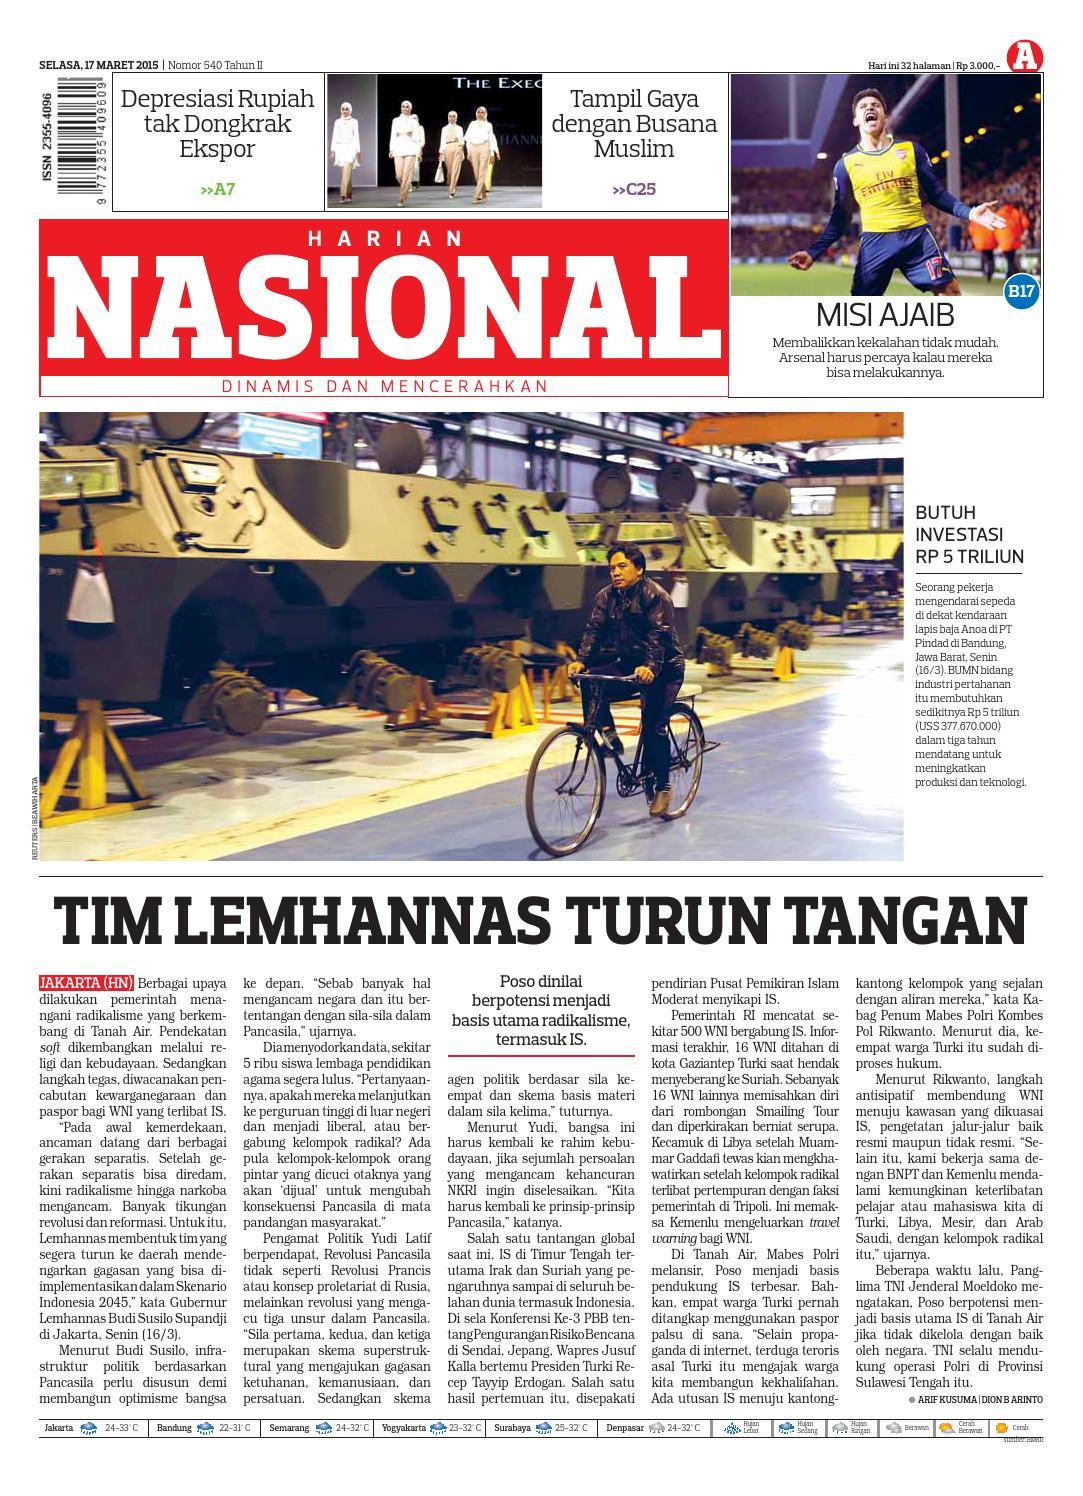 Harian Nasional By Issuu Produk Ukm Bumn Sulam Usus Pmk